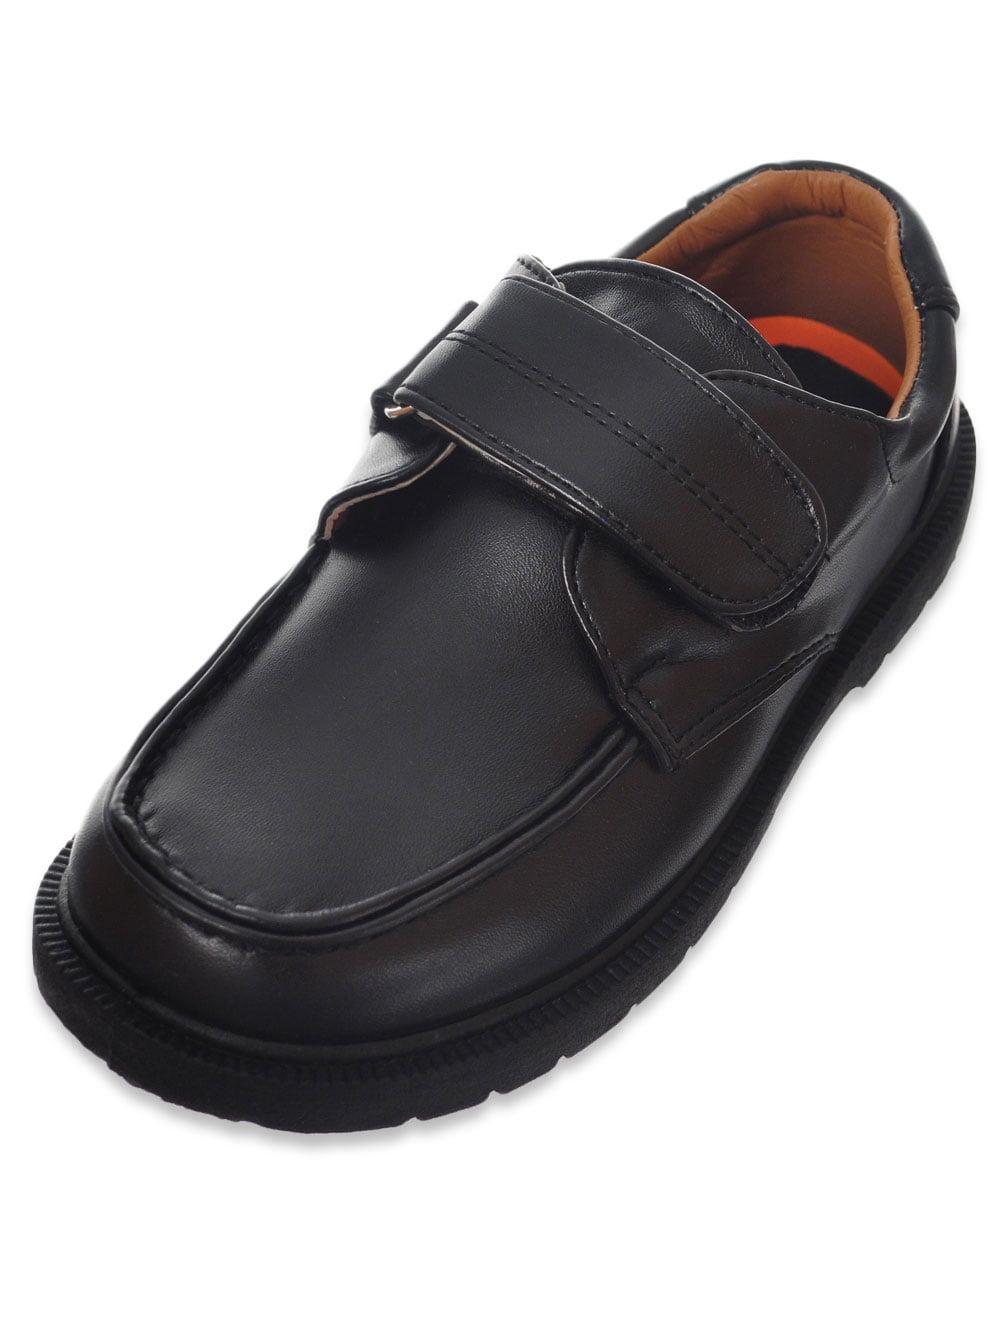 danuccelli boys' school shoes (sizes